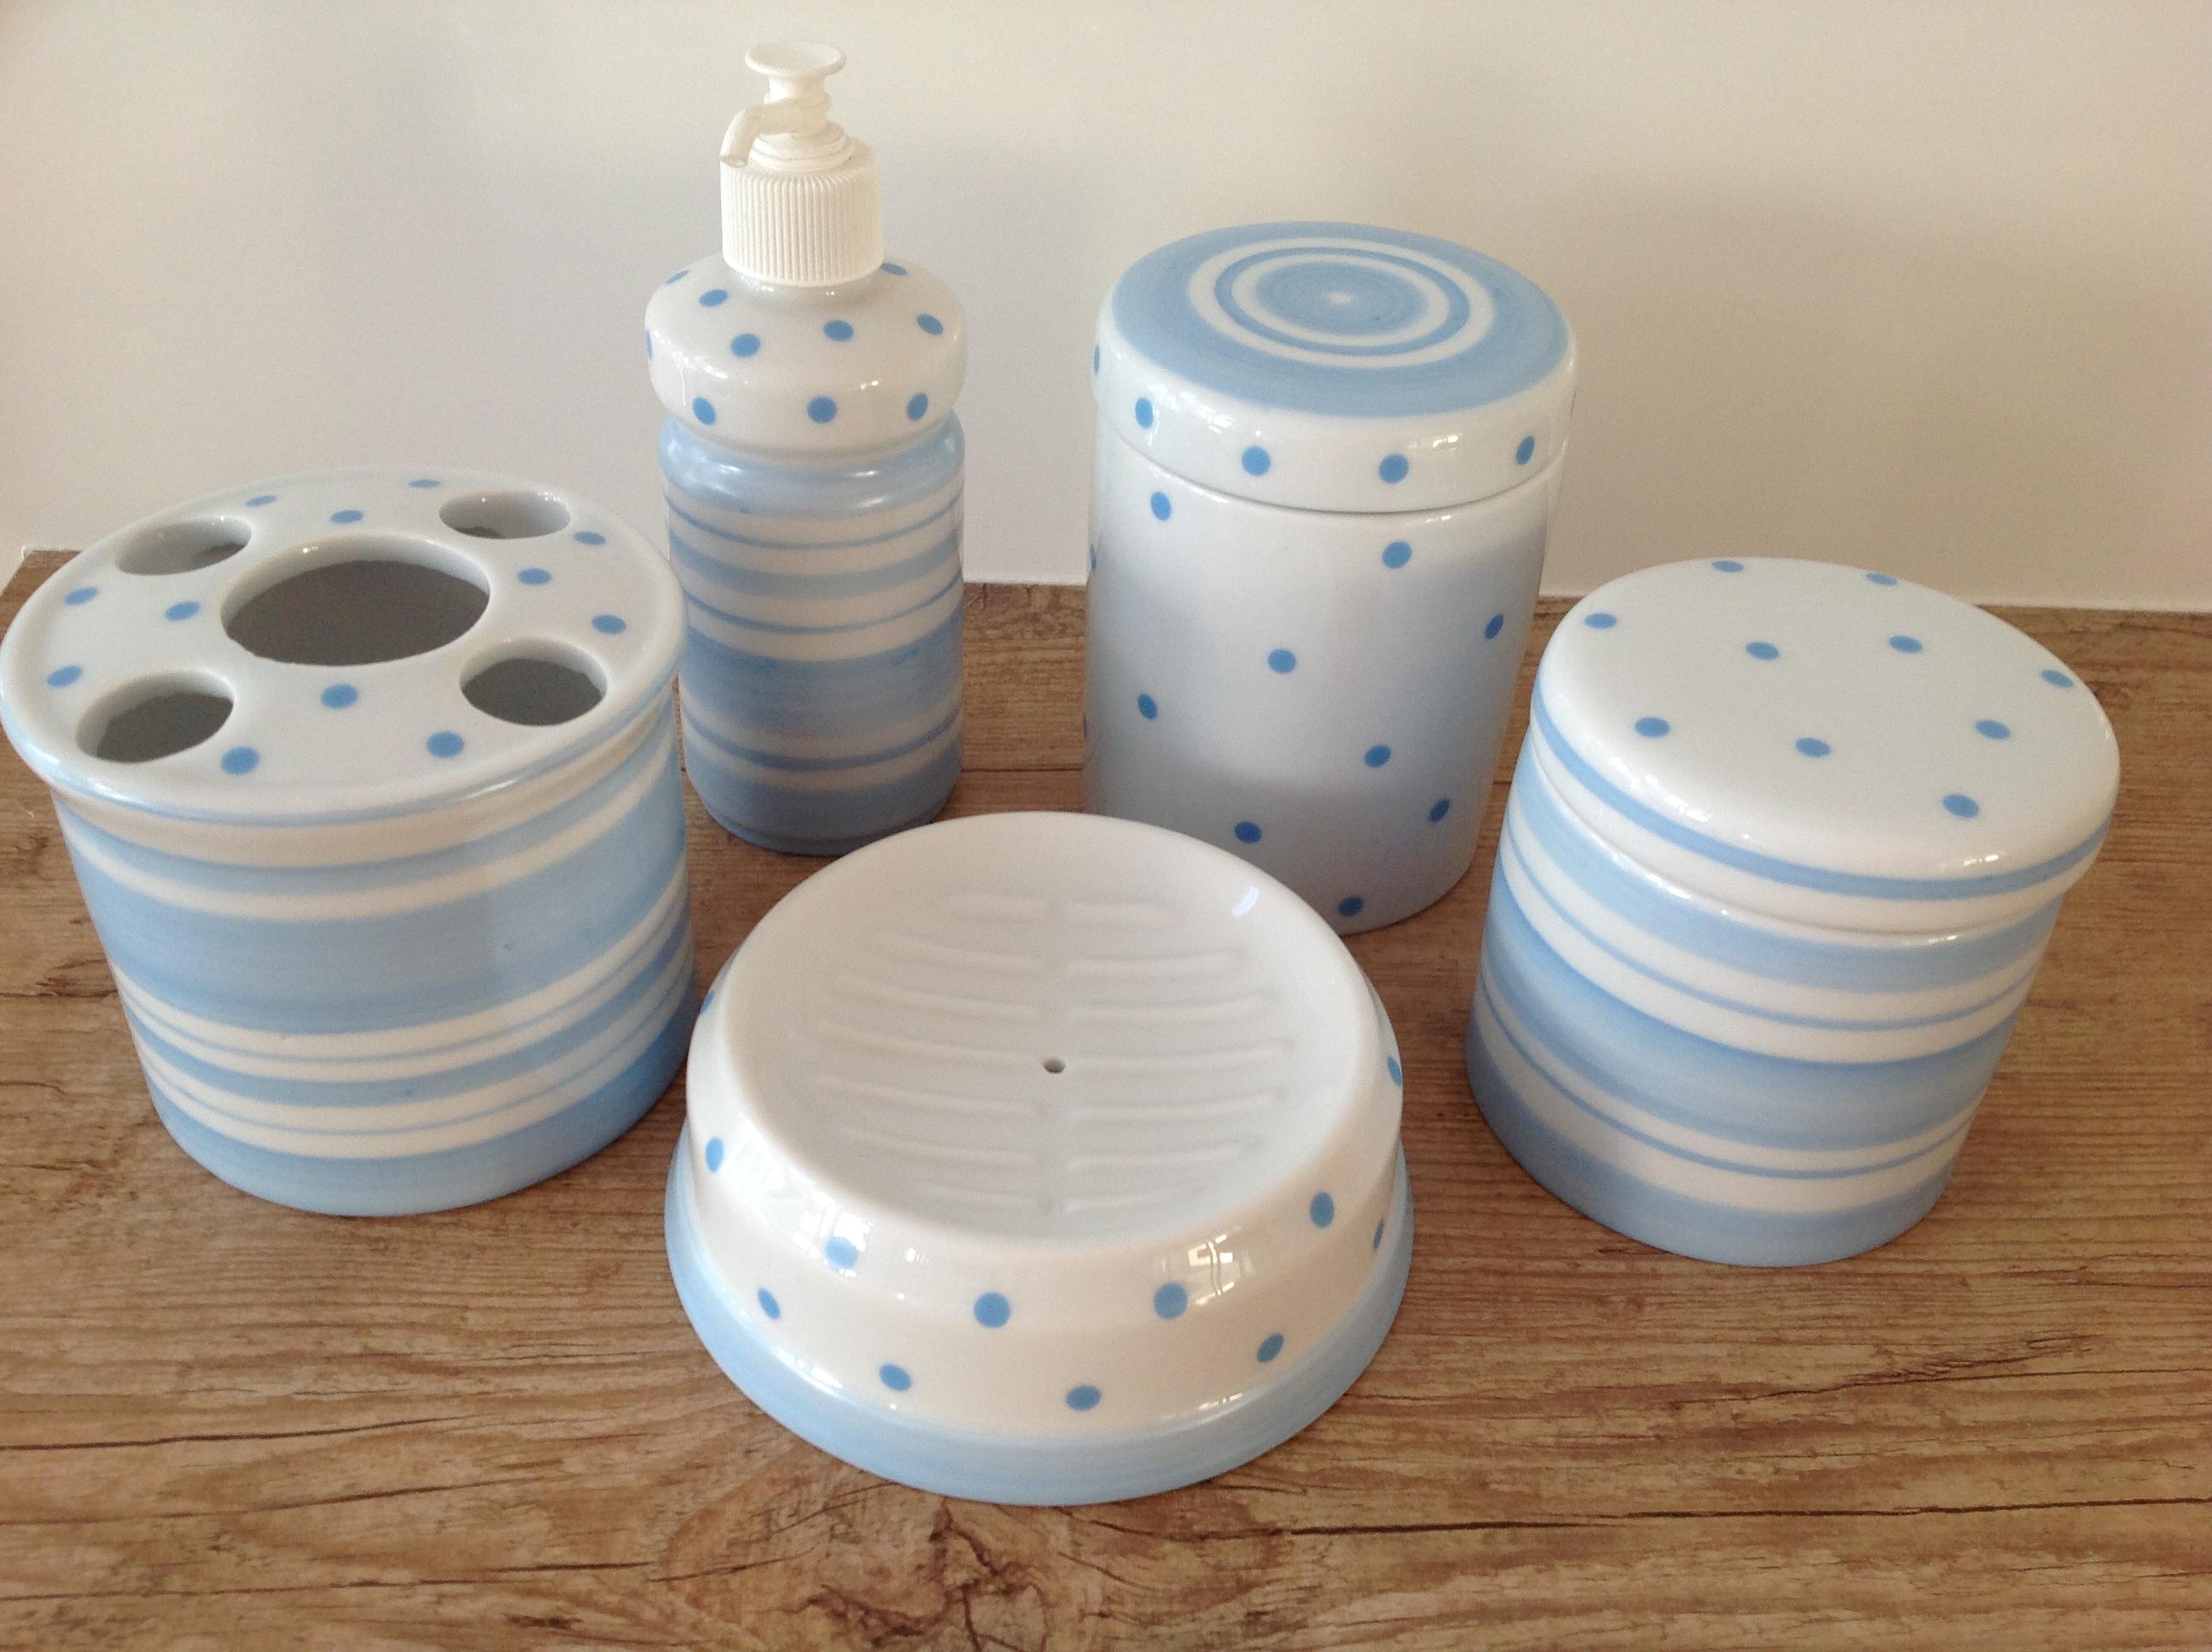 kit banheiro listras e poa azul kit potes banheiro porcelana  #6F4932 2592 1936